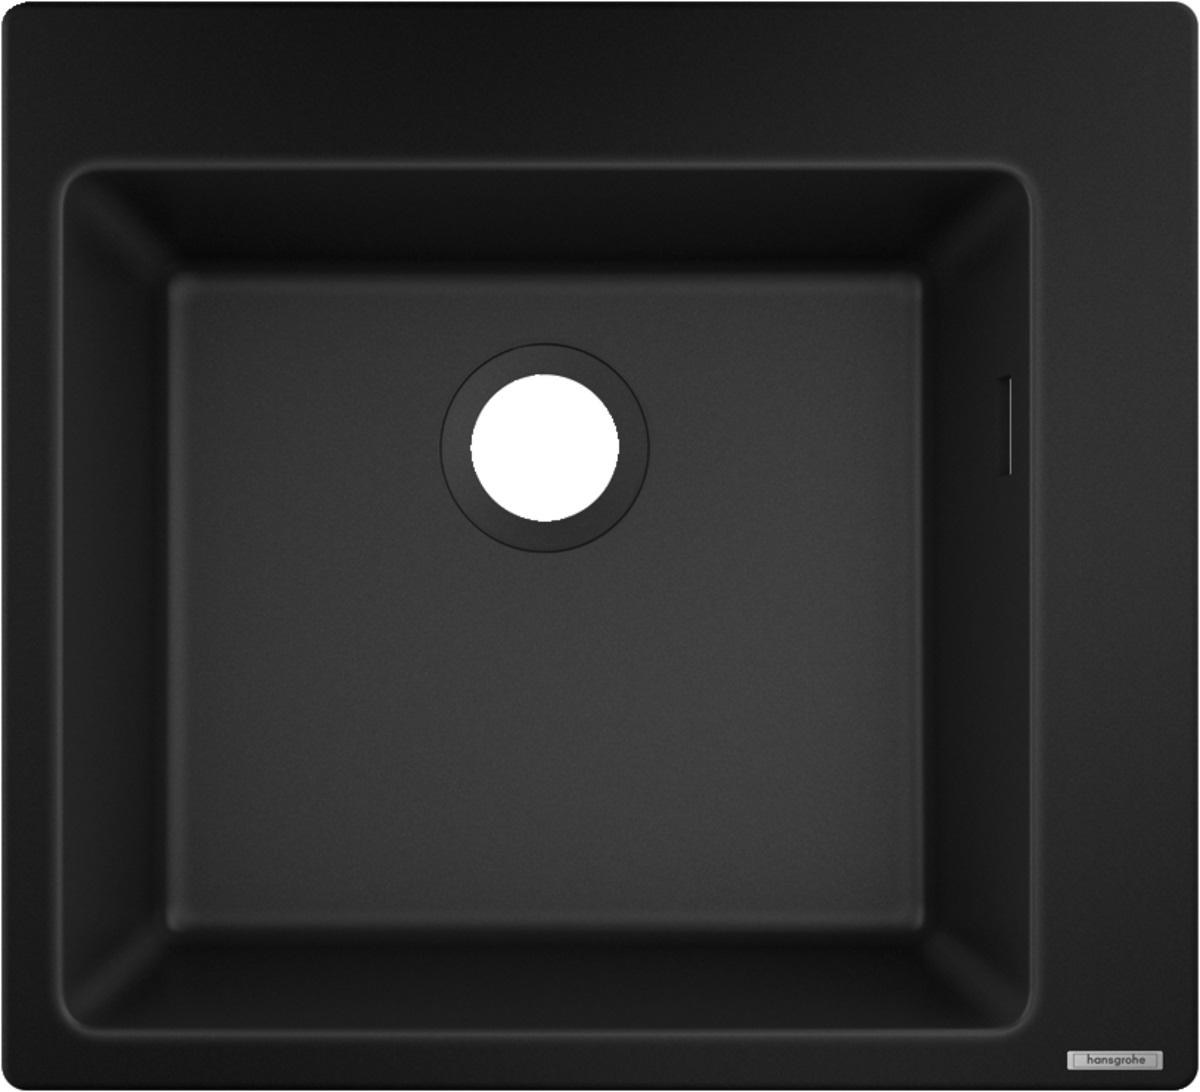 Chiuveta Hansgrohe S510-F450 SilicaTec 450 51x56x19cm graphite black